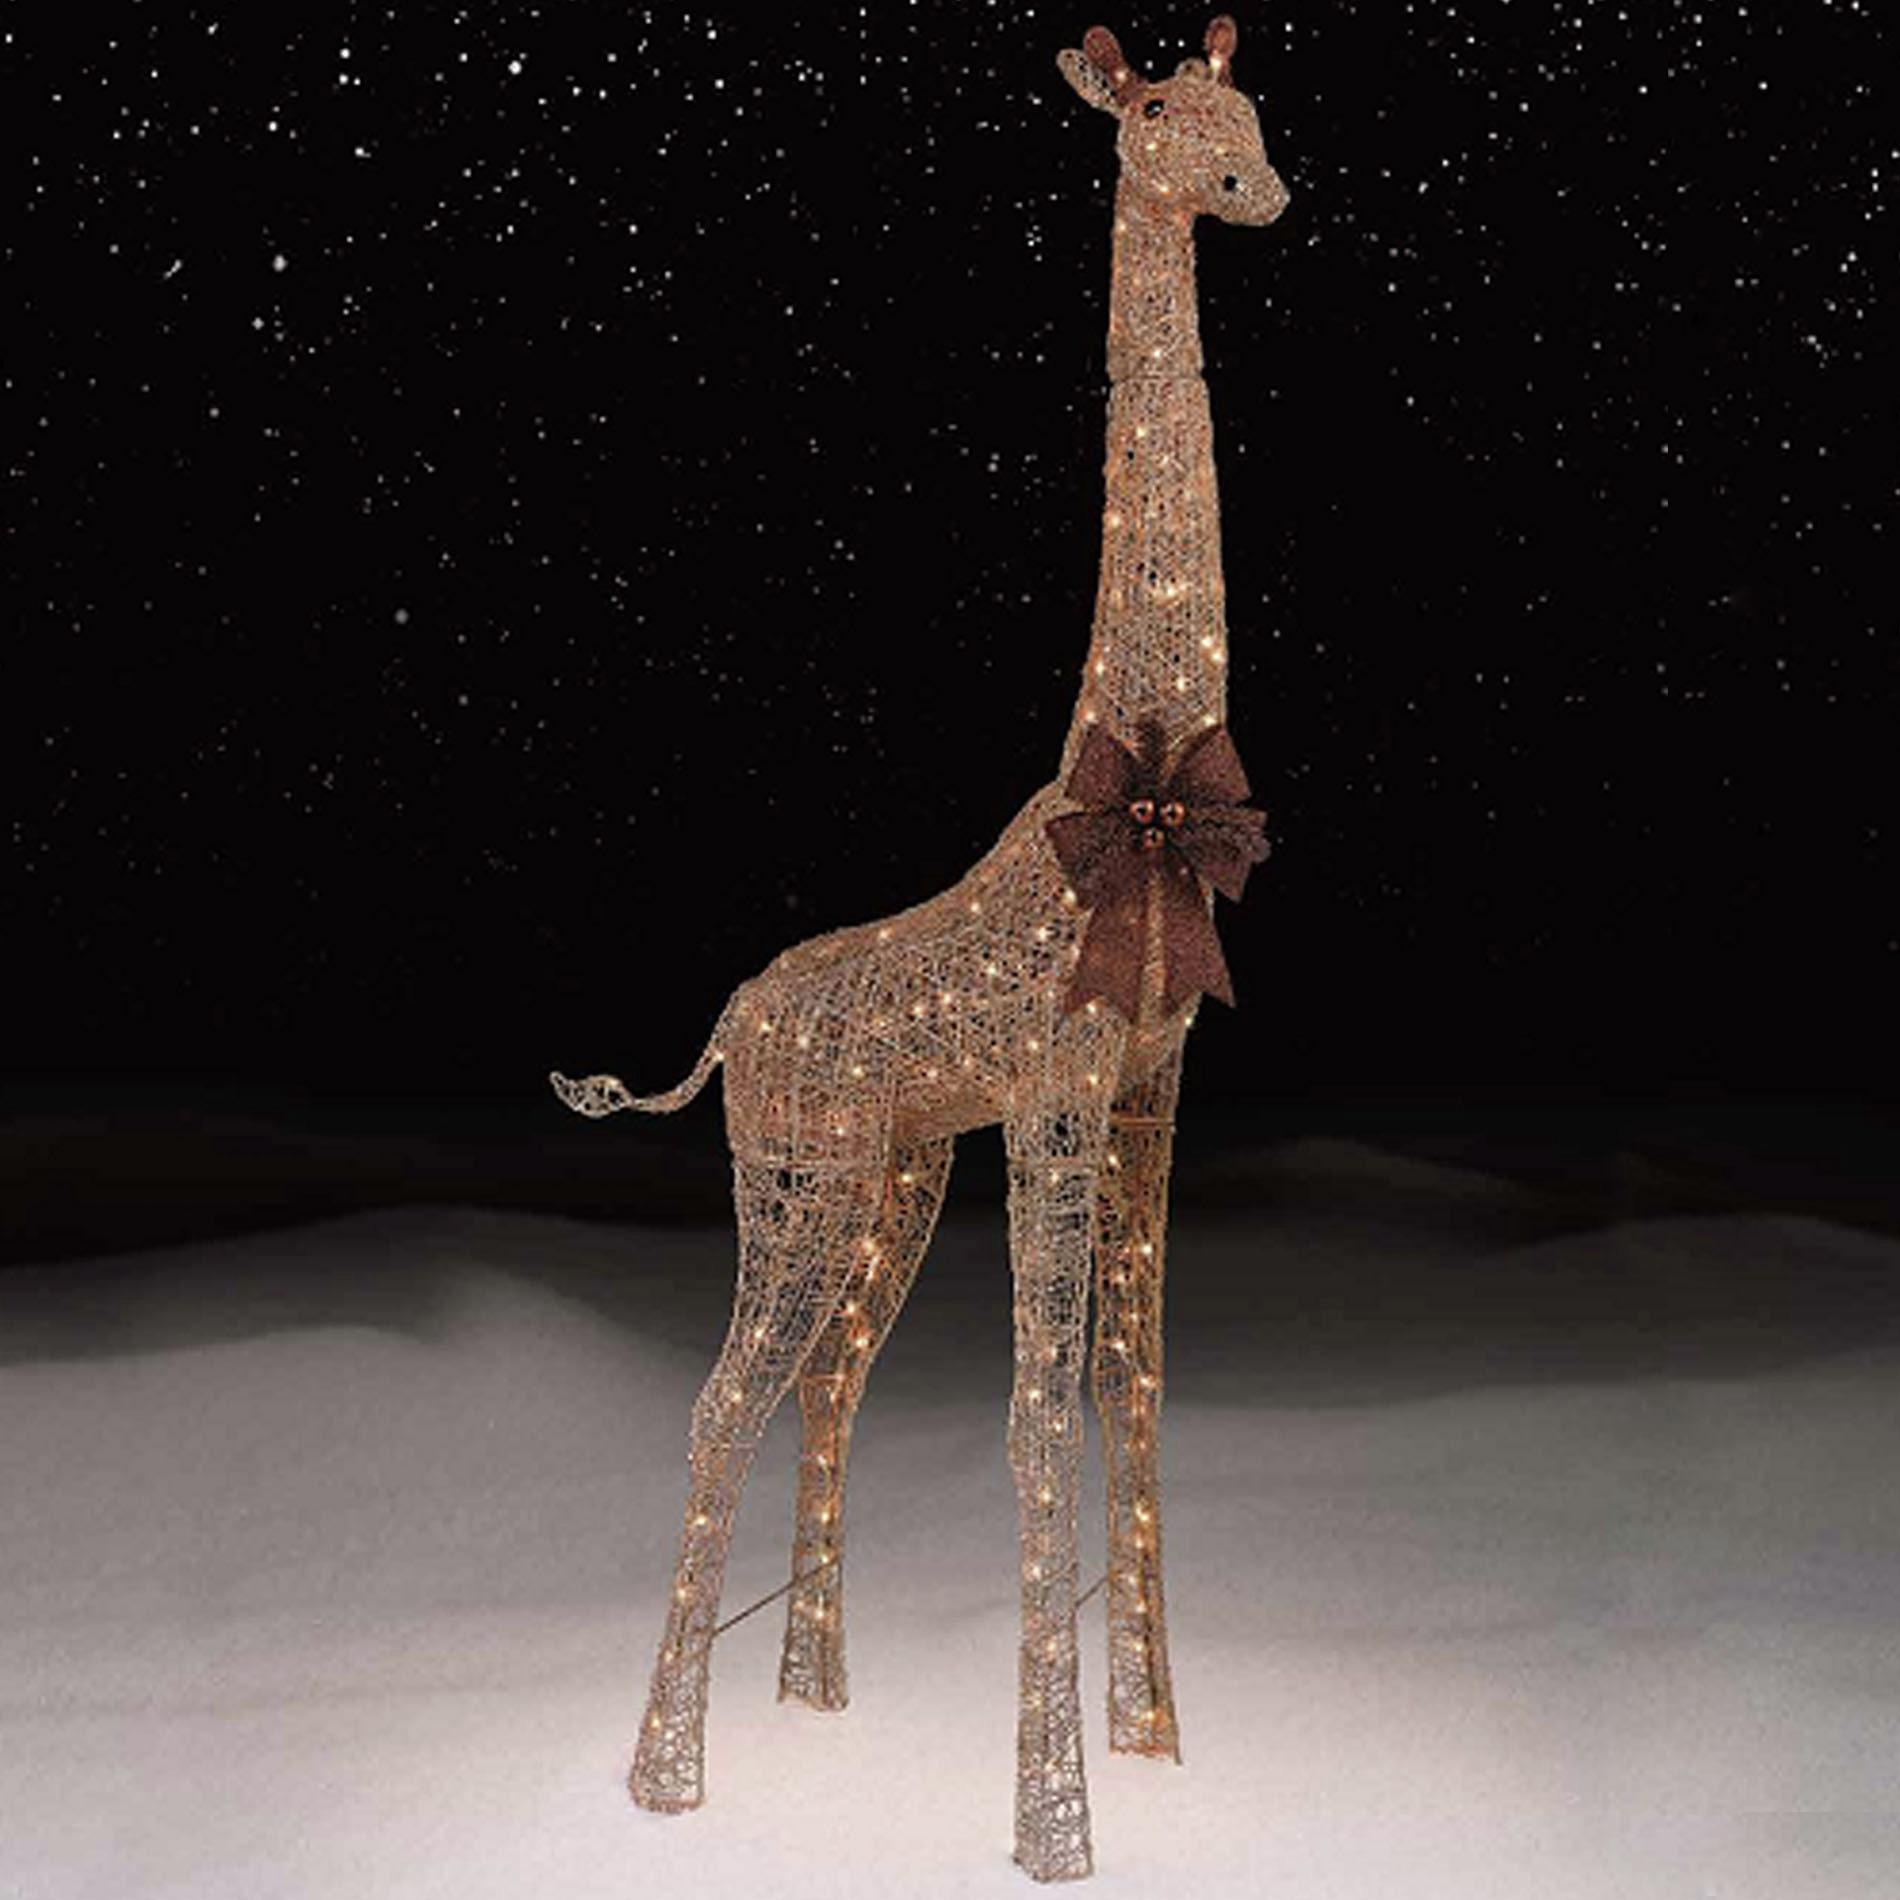 72 Gold Giraffe with 200 LightsKmart